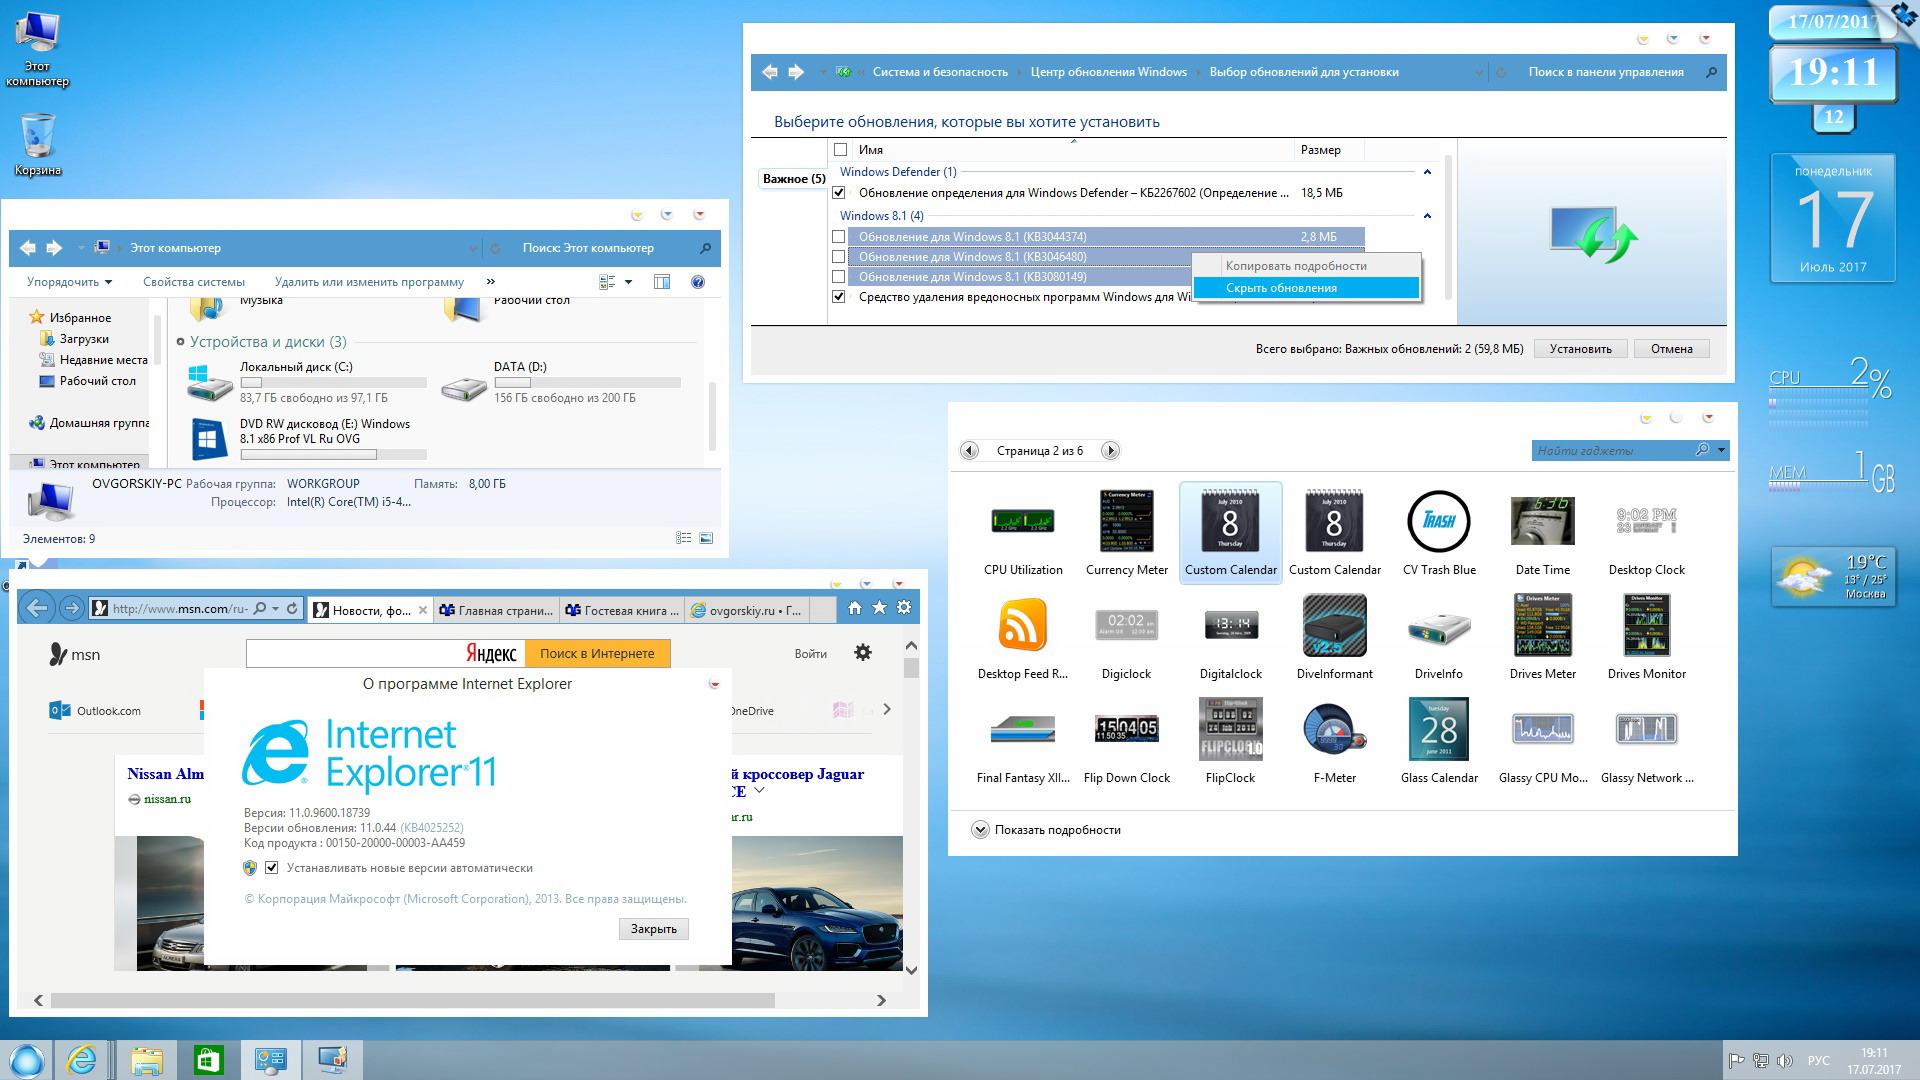 Windows 8.1 Professional VL with Update 3 x86/x64 Ru by OVGorskiy® 07.2017 2DVD (2017) Русский